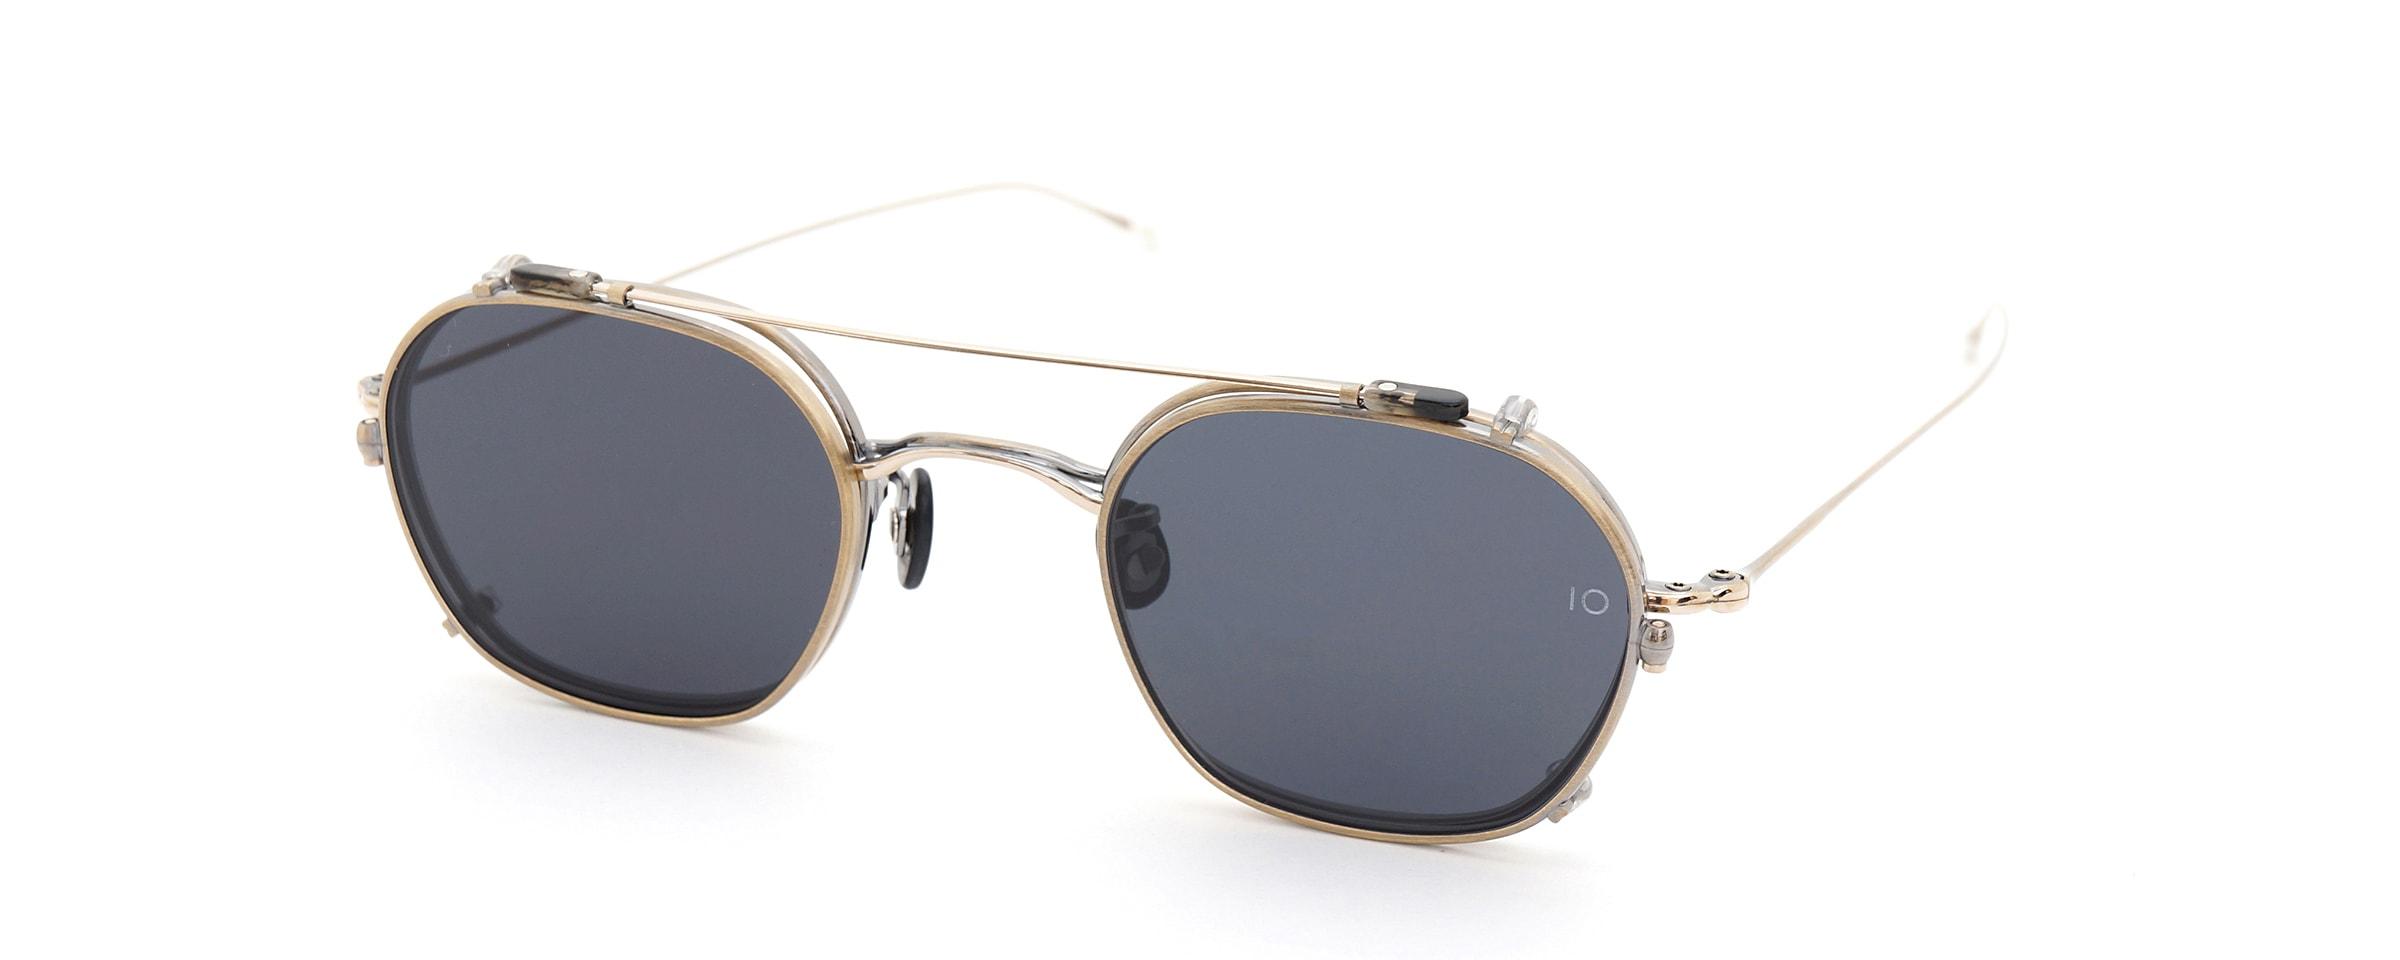 10 eyevan NO.2 +SLIDE CLIP 4S-CL OldGold全体像